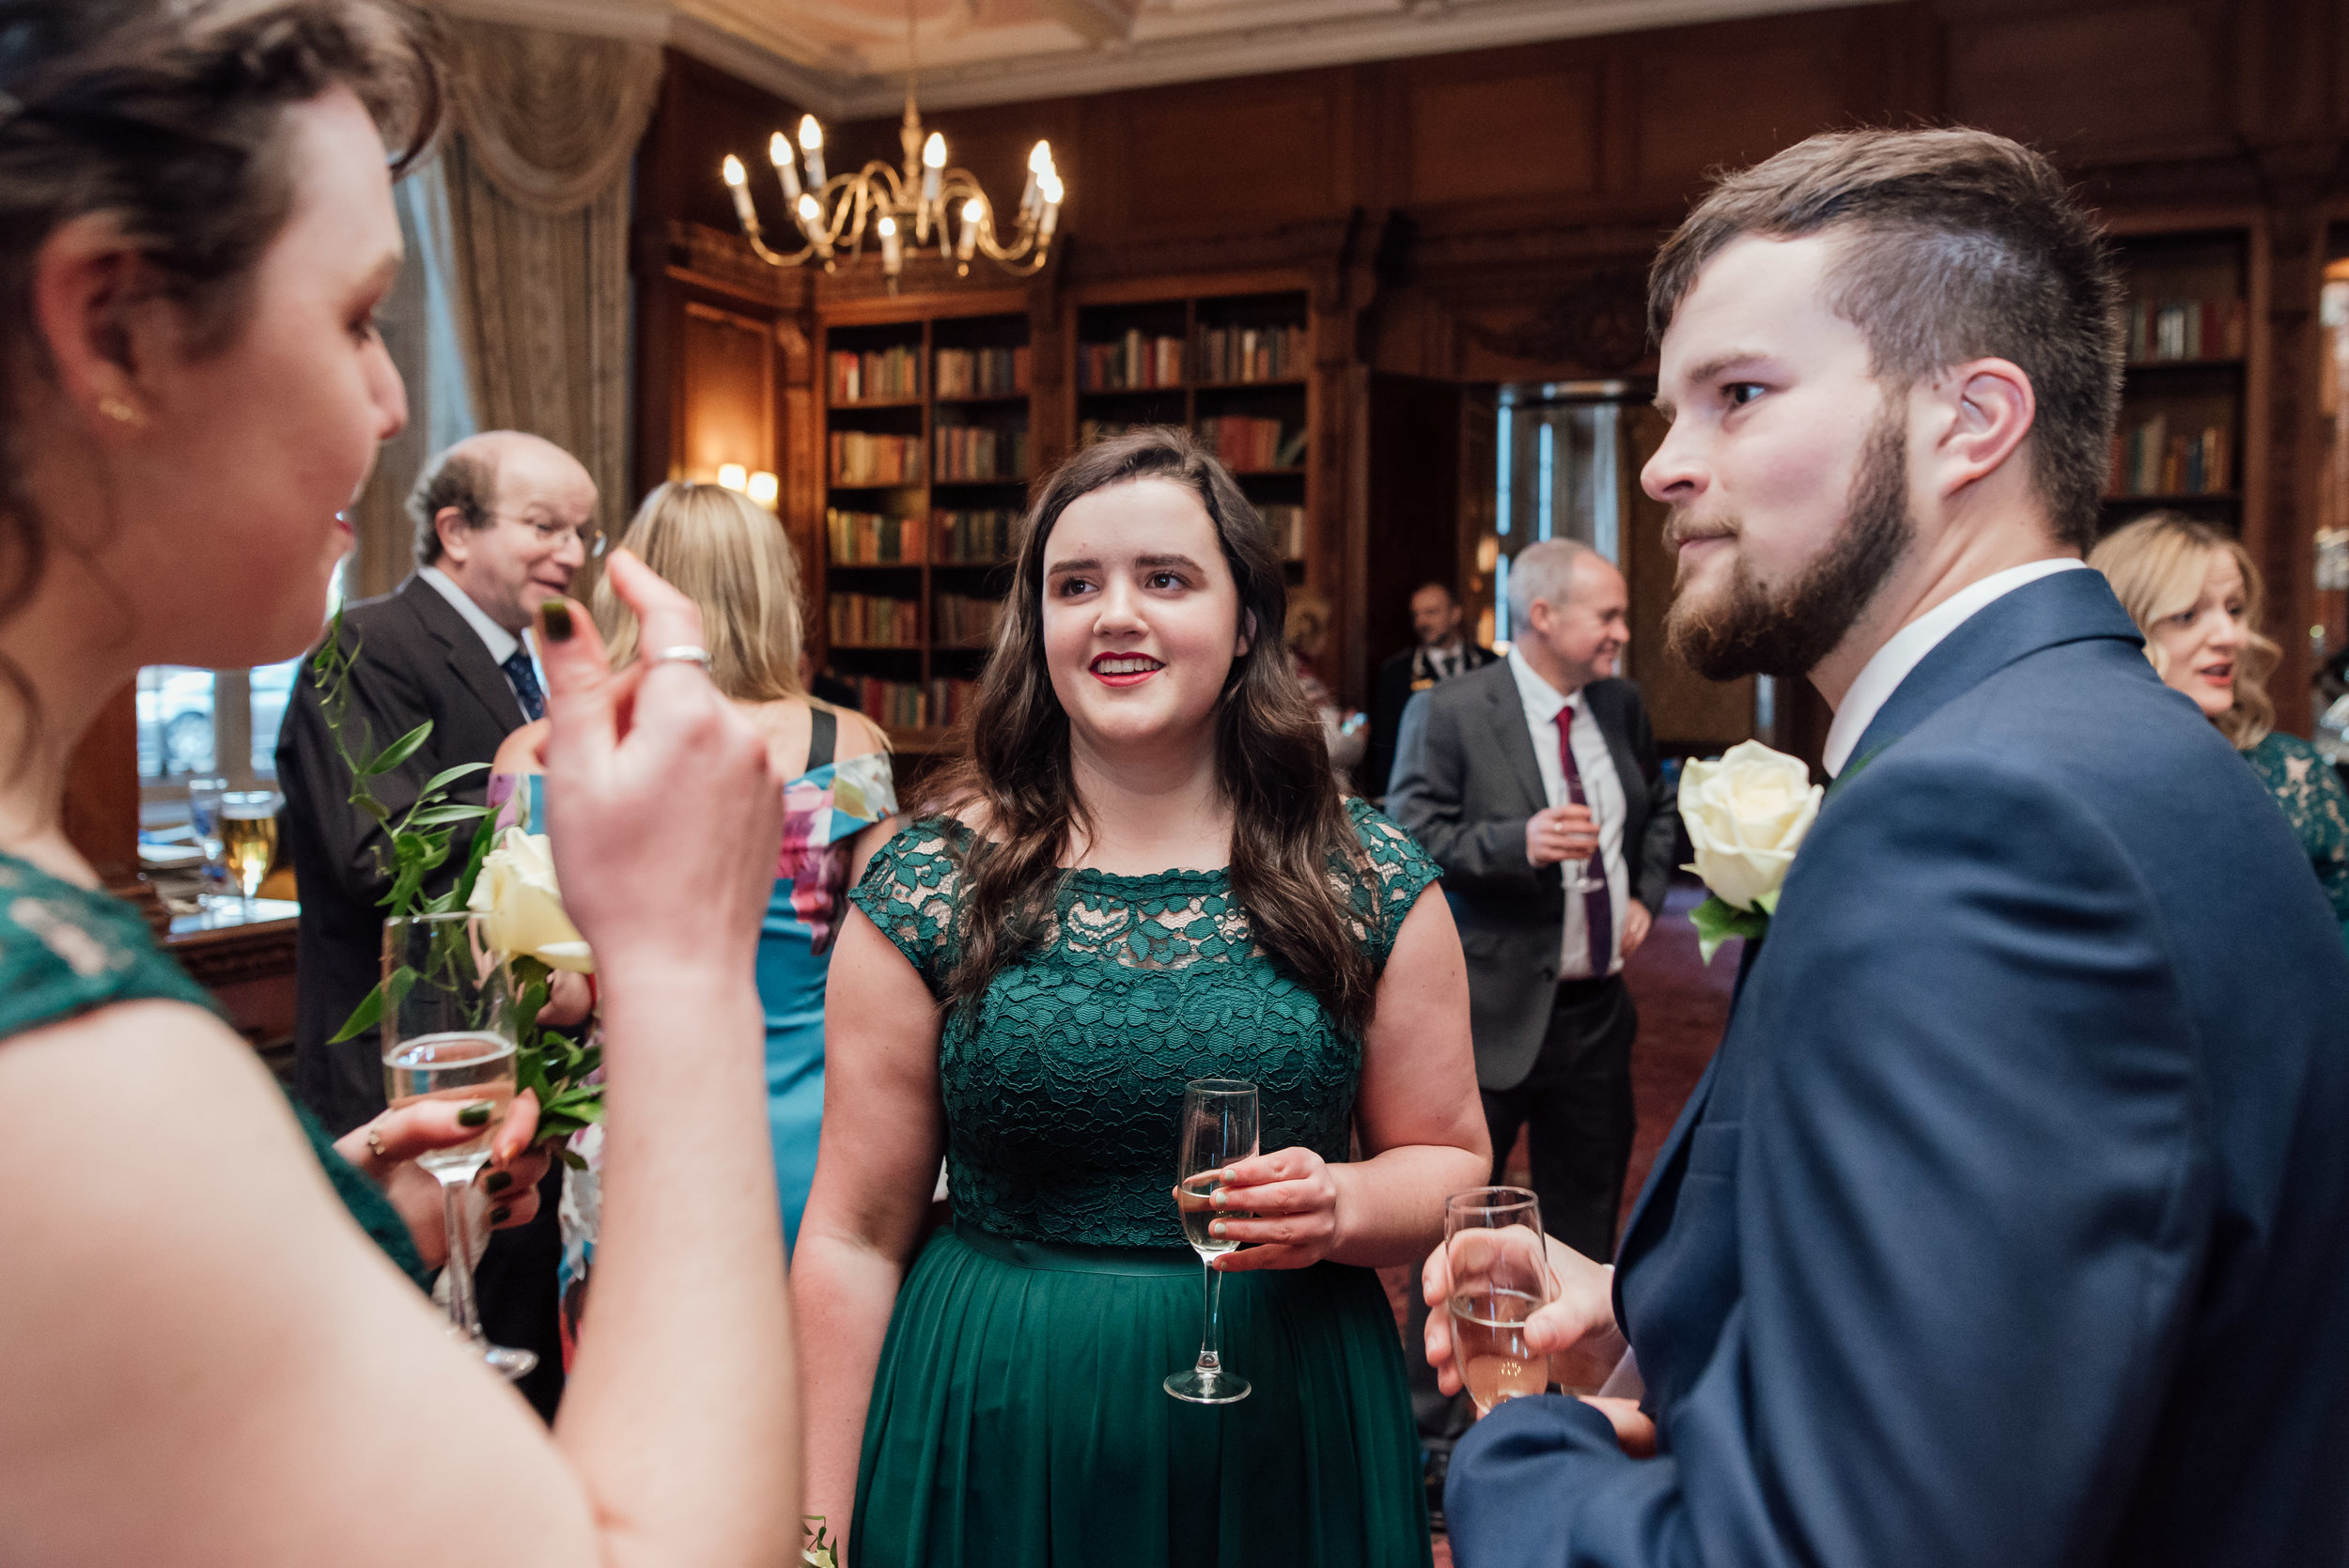 Hampshire-wedding-photographer-hampshire : Amy-James-Photography : Tylney-Hall-Wedding : Tyleny-Hall-Wedding-Photographer : Hampshire-wedding-venue : Fleet-wedding-photographer-farnborough-479.jpg